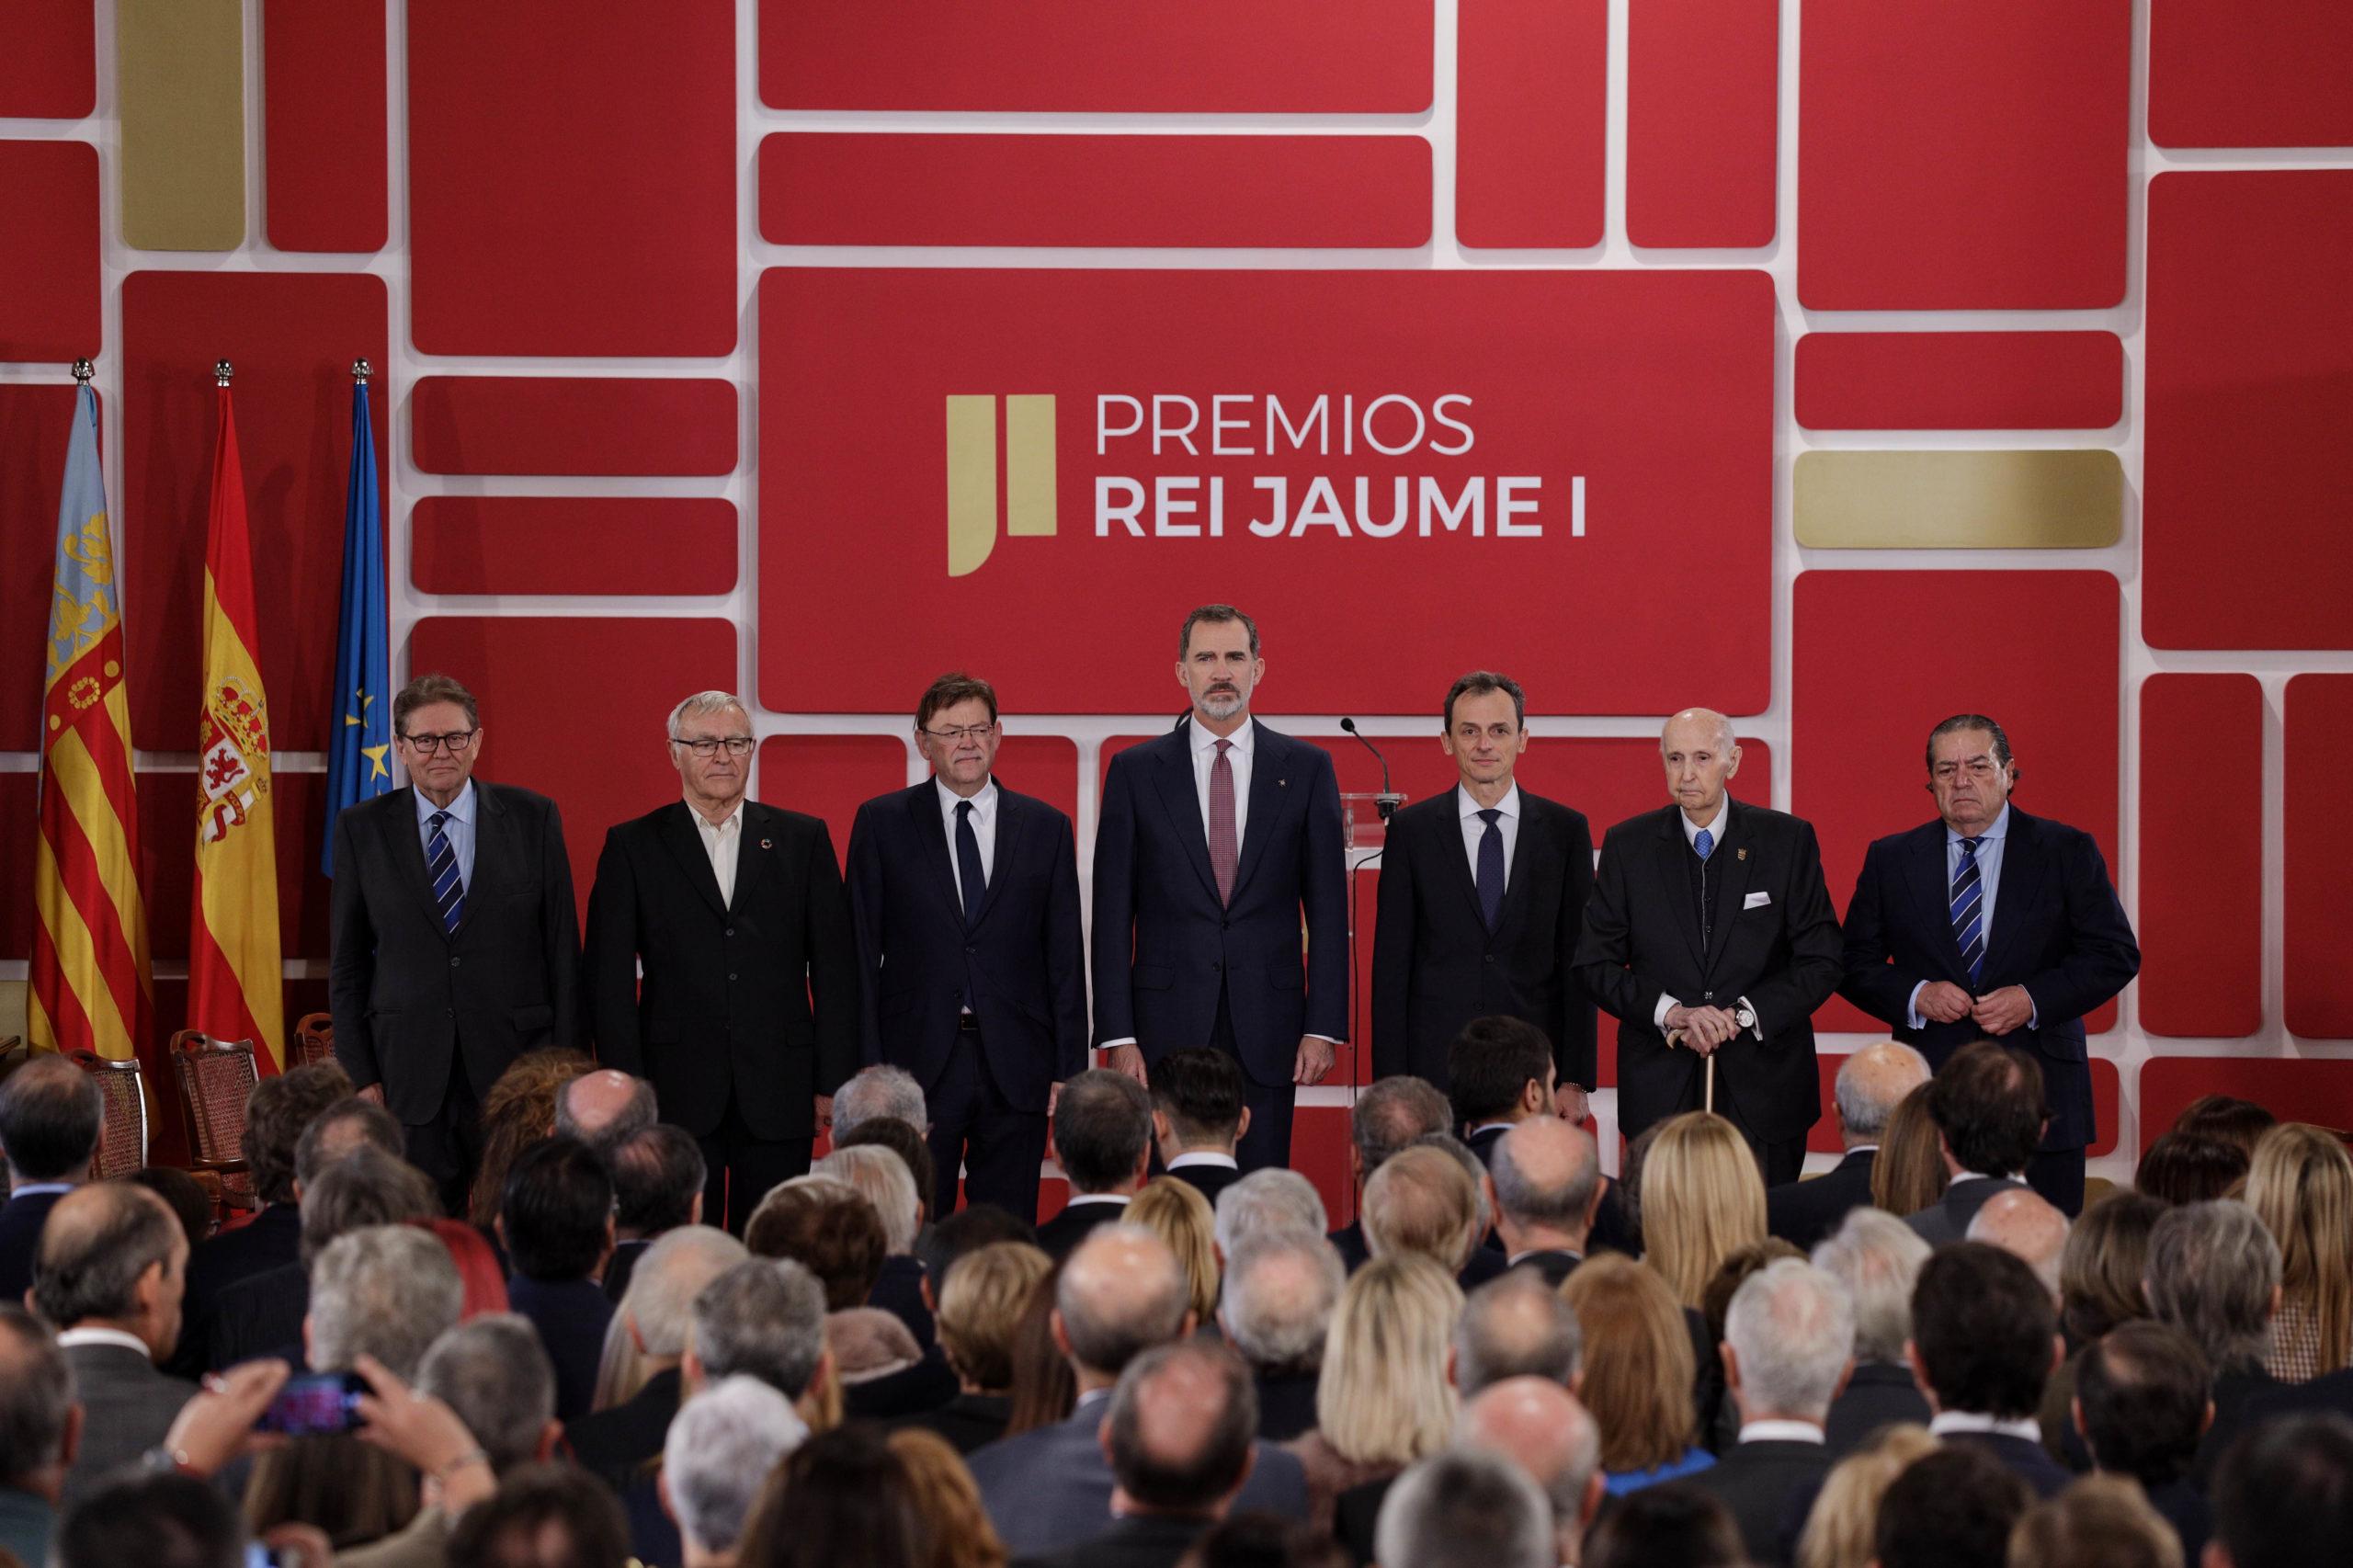 Premios Jaume I